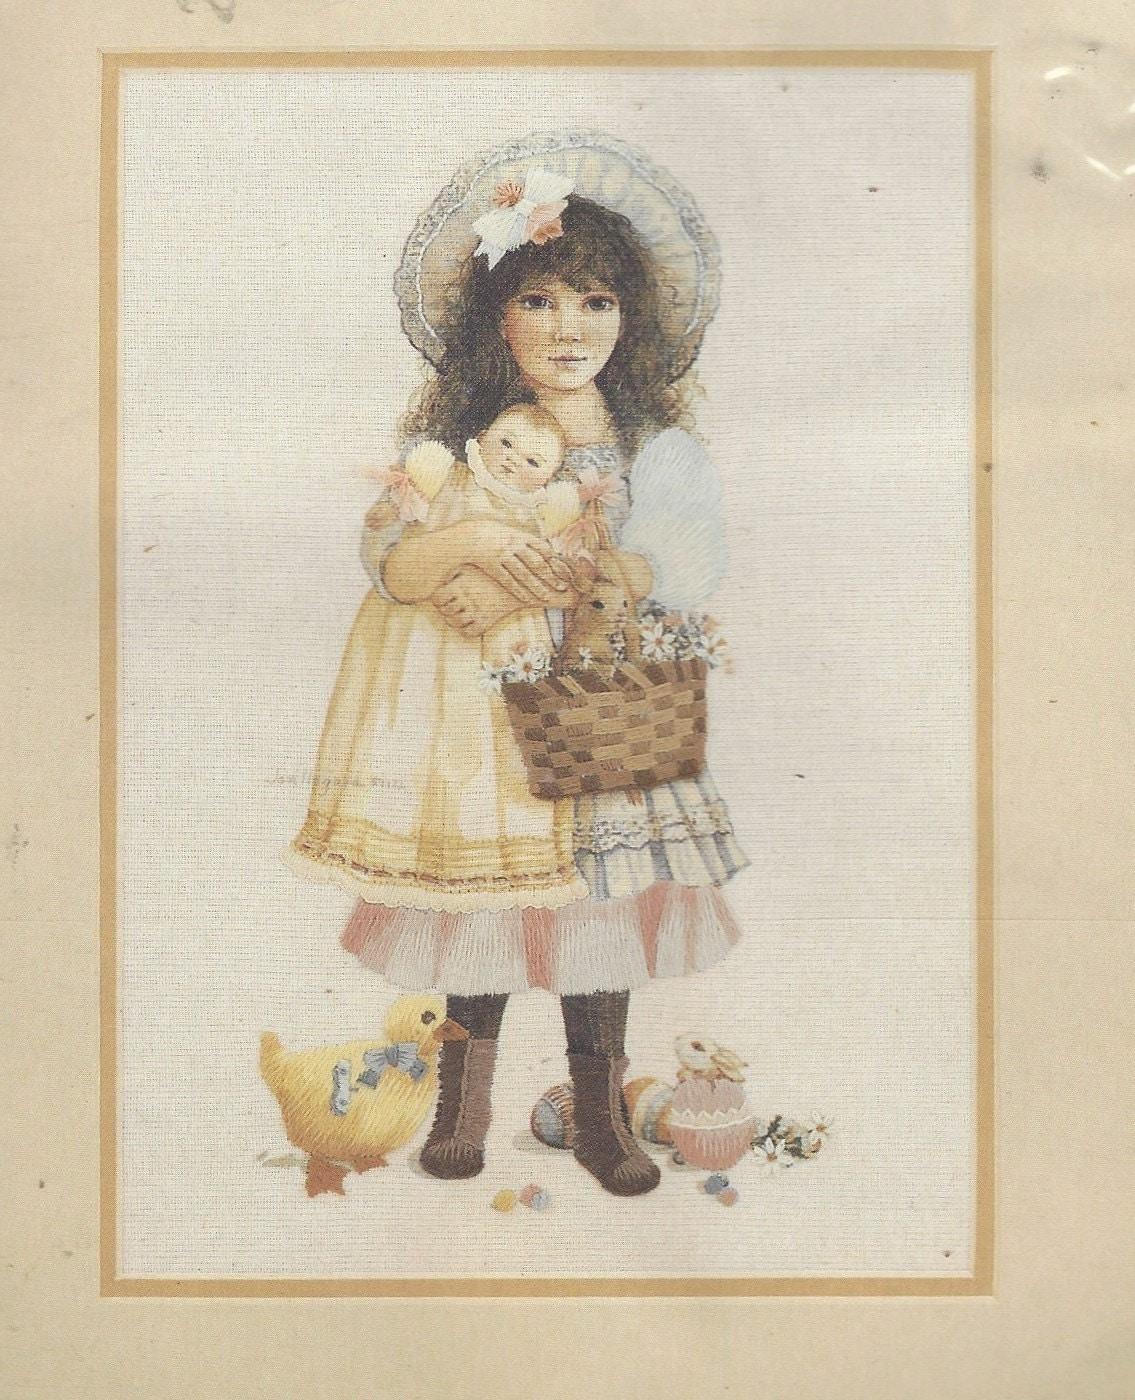 Jan Hagara Lithograph: Jan Hagara Victoria Needle Treasures Stitchery Kit